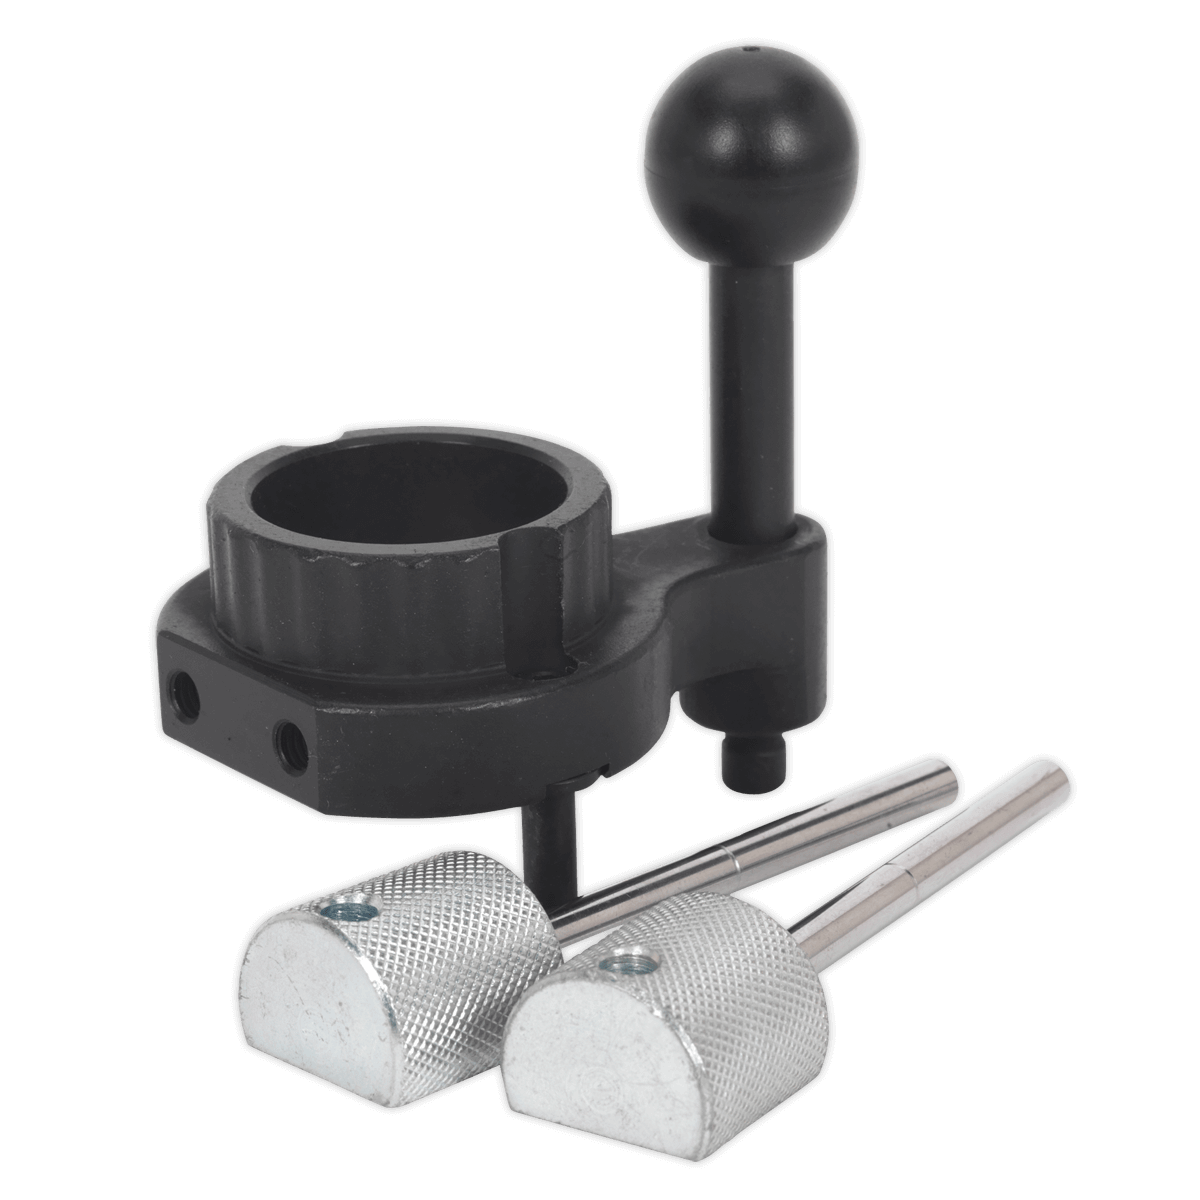 Sealey VSE2090 VAG Diesel Engine Setting and Locking Kit